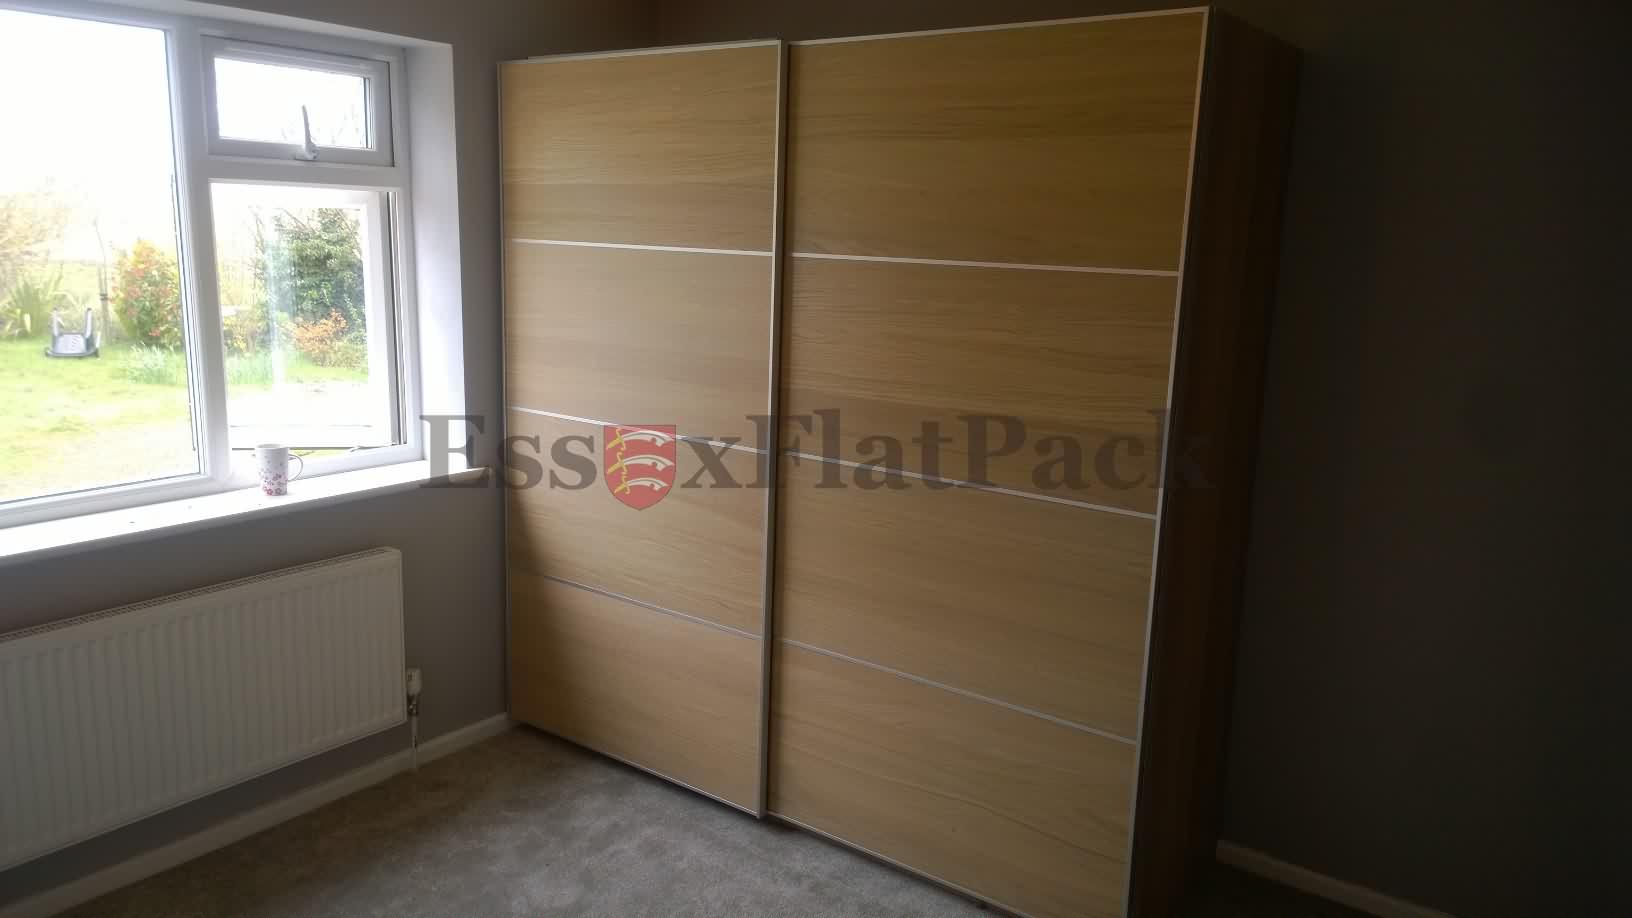 essexflatpack-furniture-20160407111941.jpg